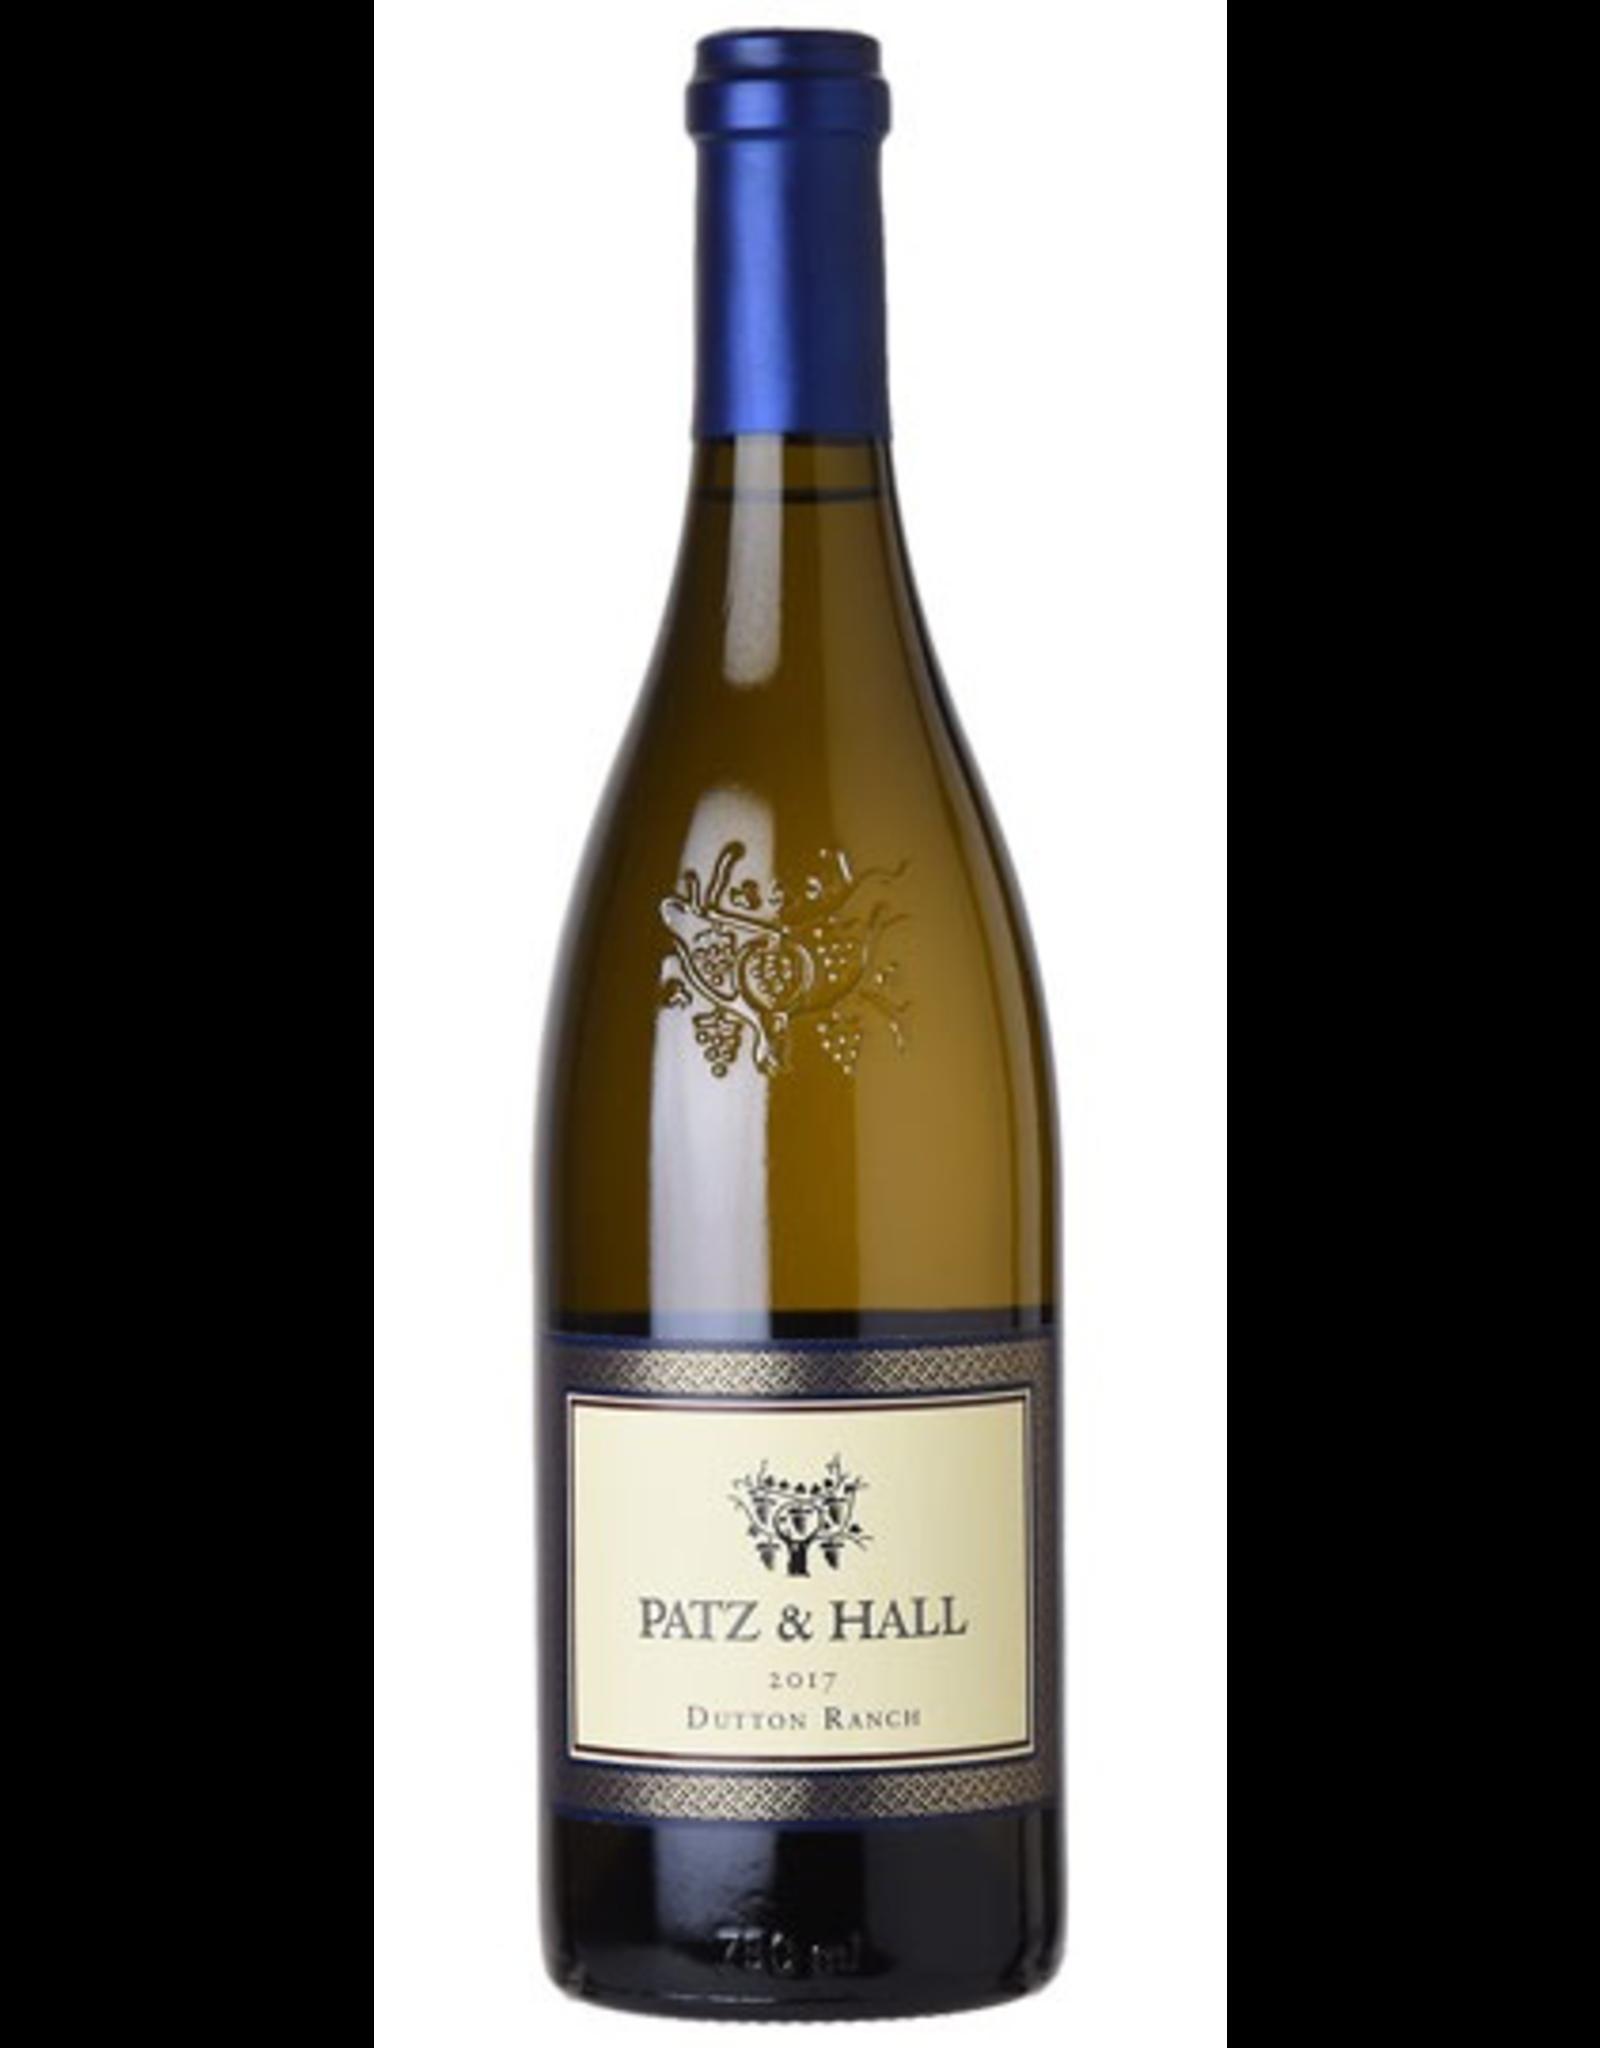 White Wine 2017, Patz & Hall Dutton Ranch, Chardonnay, Russian River Valley, Sonoma County, California, 14.2% Alc, CTnr, RP92